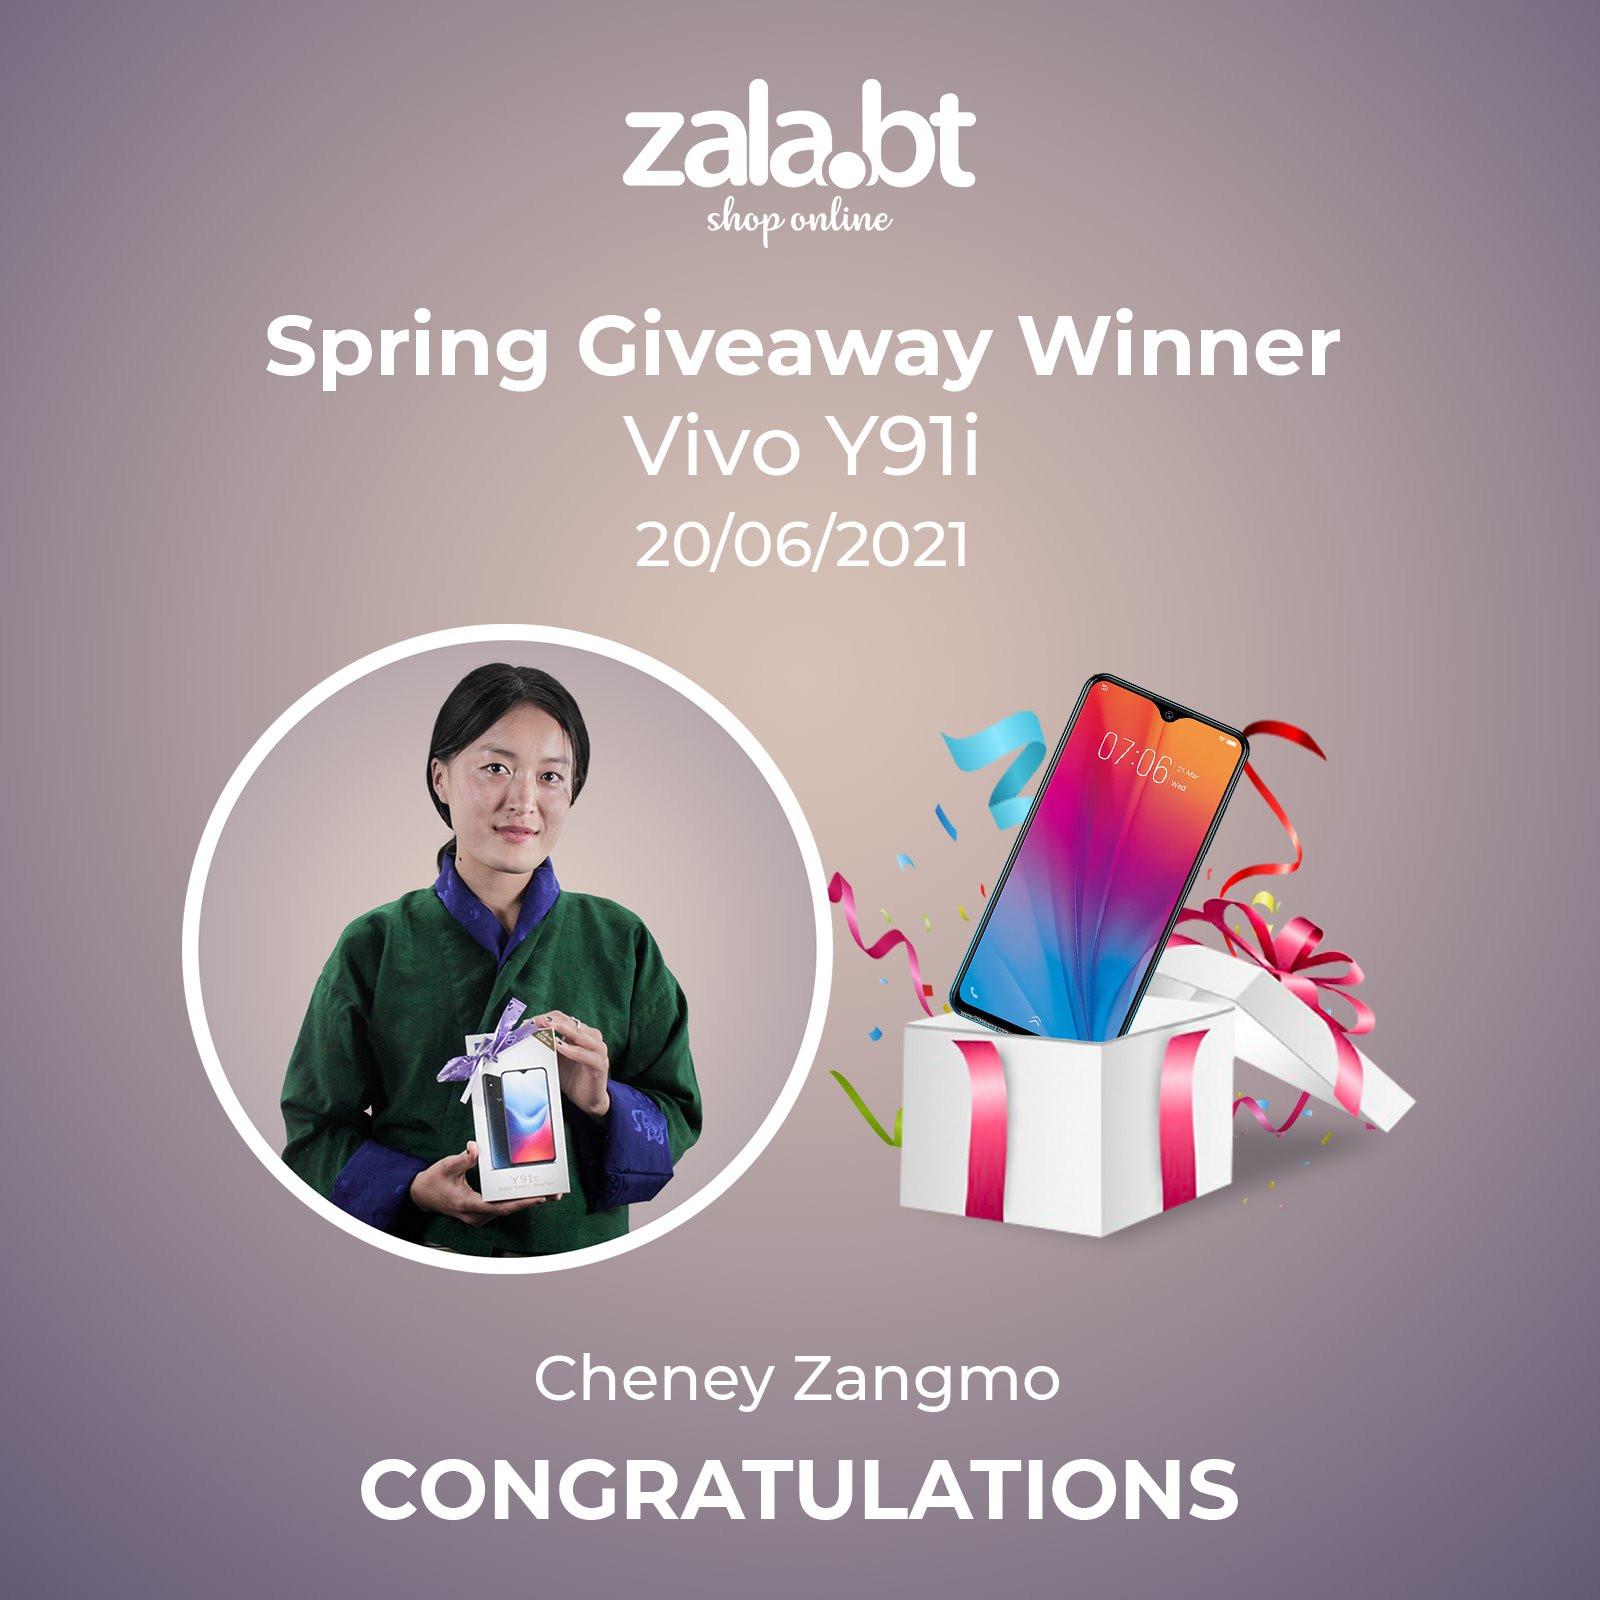 Zala.bt Spring Giveaway 1st Lucky winner